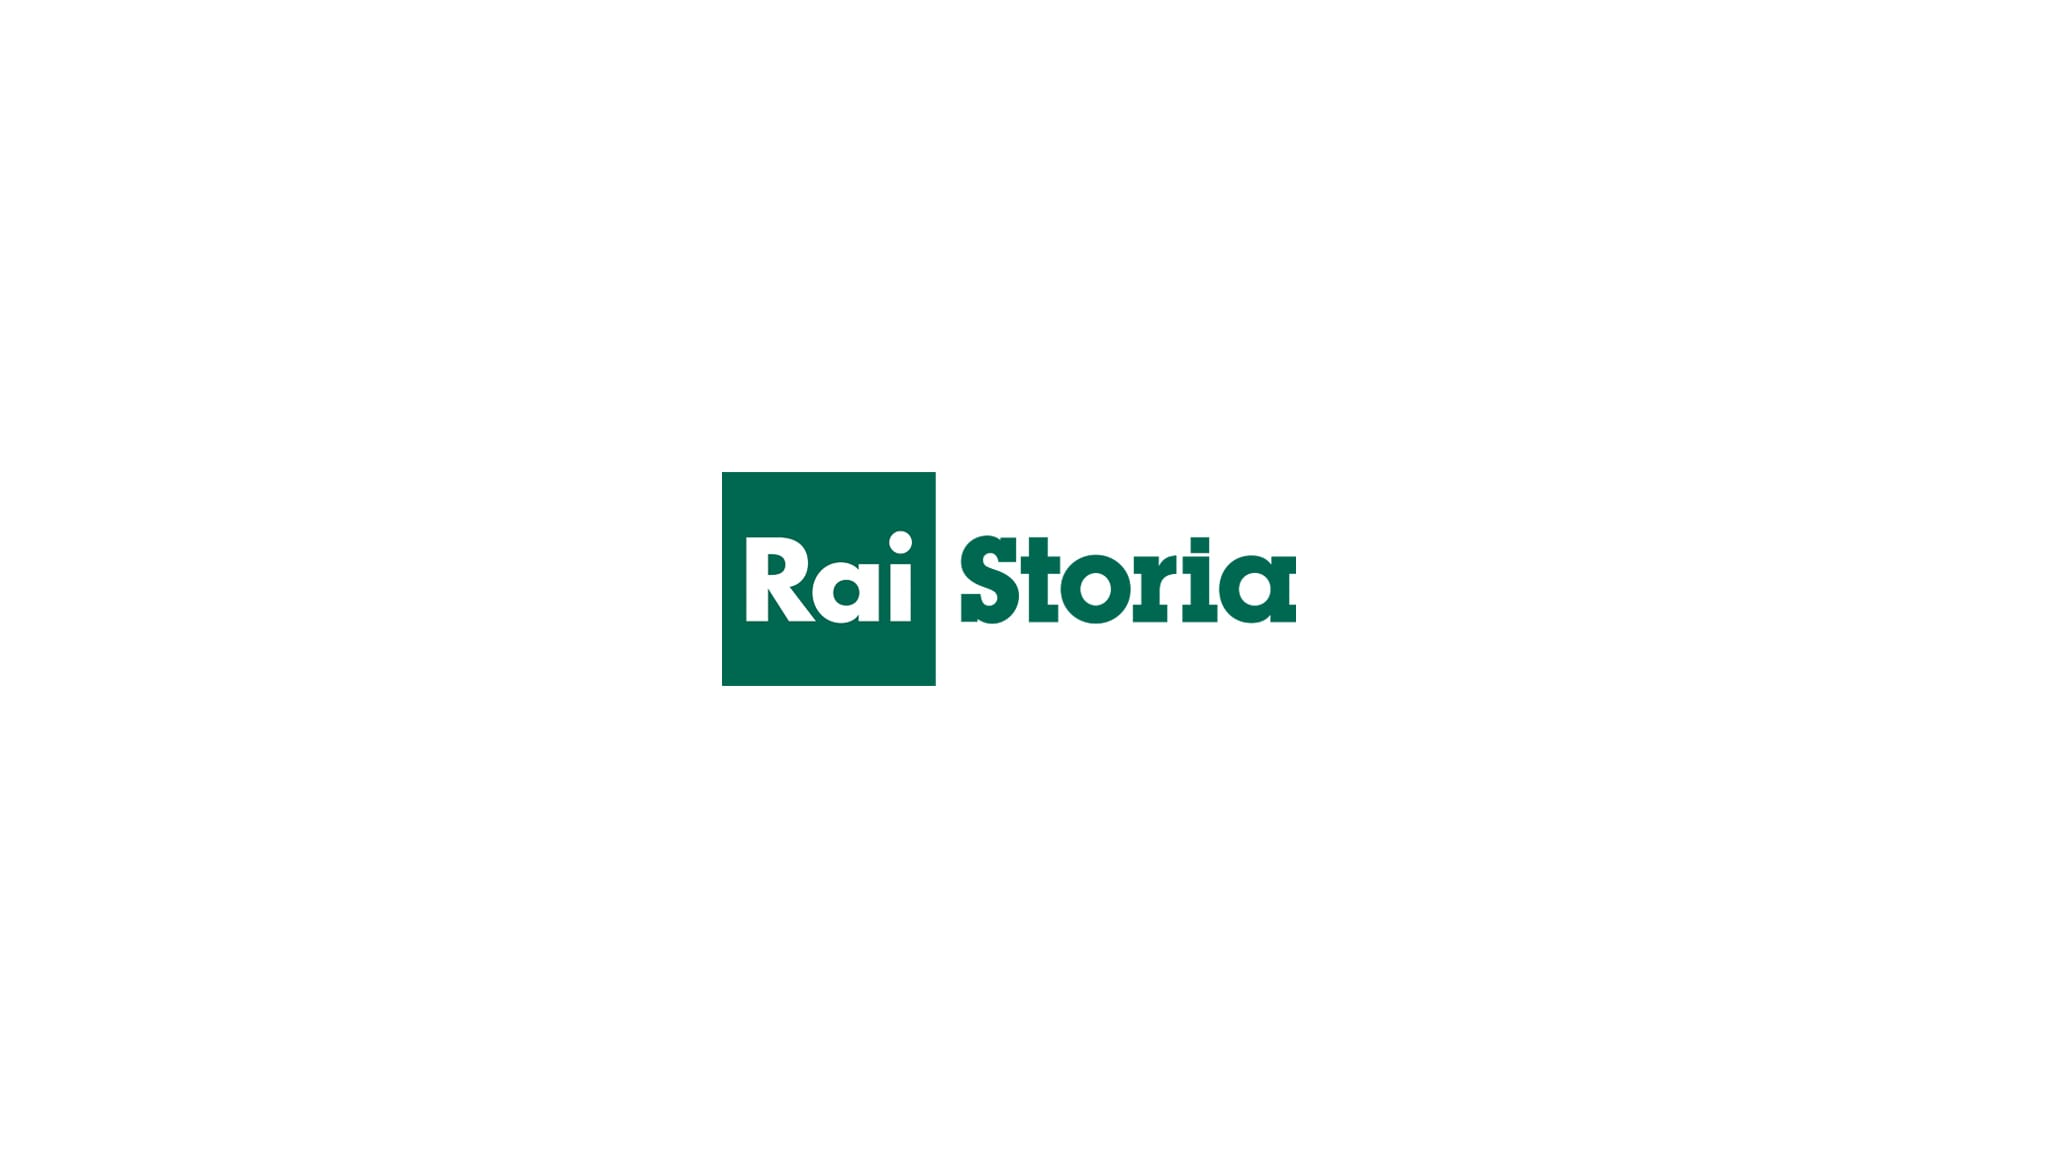 Rai Storia La Straordinaria Storia d'Italia - Medioevo - I Longobardi